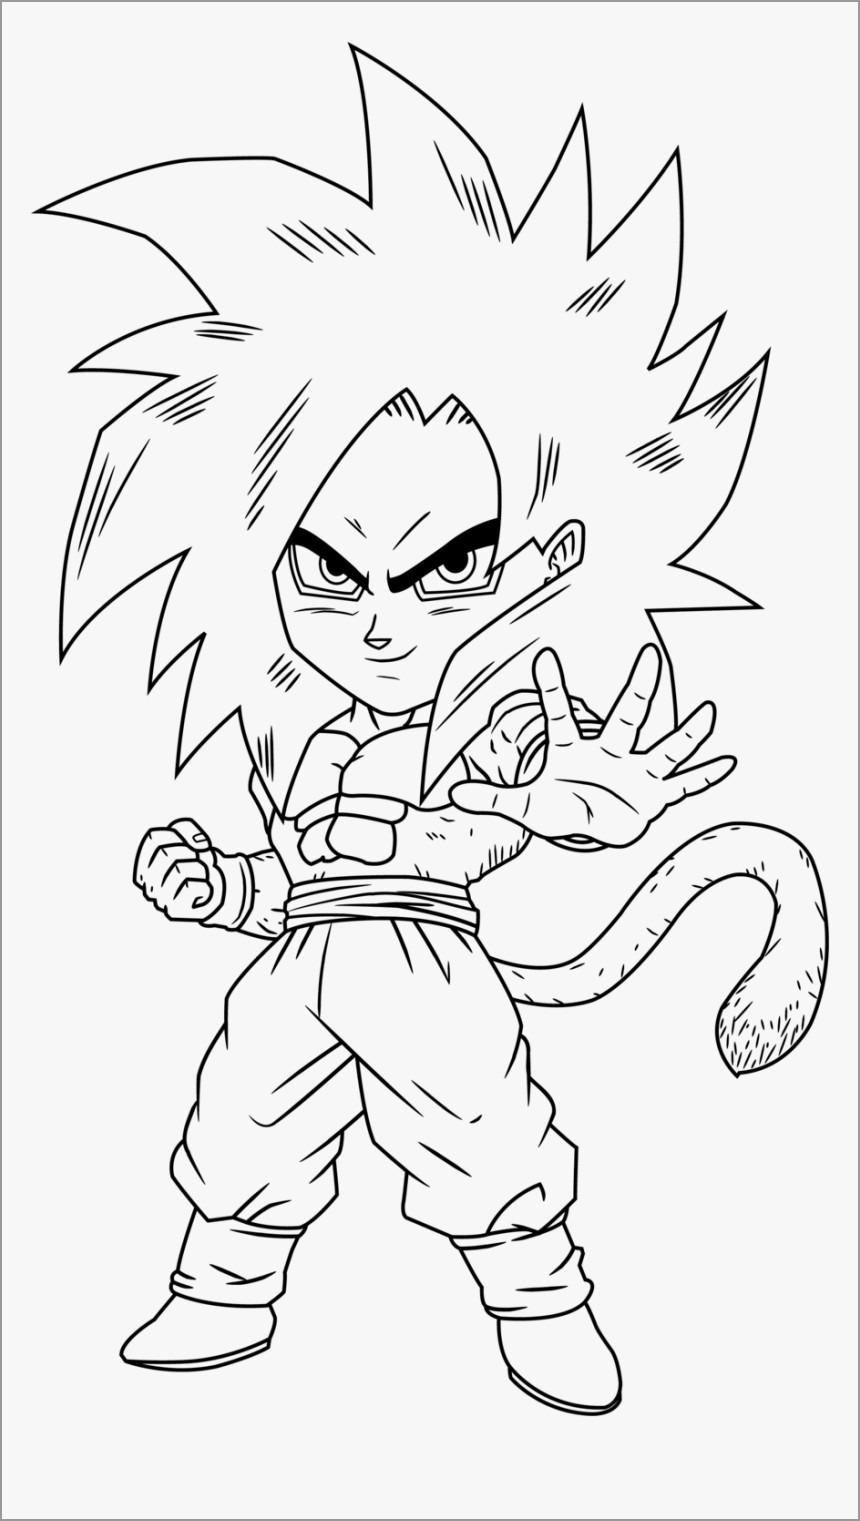 Goku Chibi Anime Coloring Page